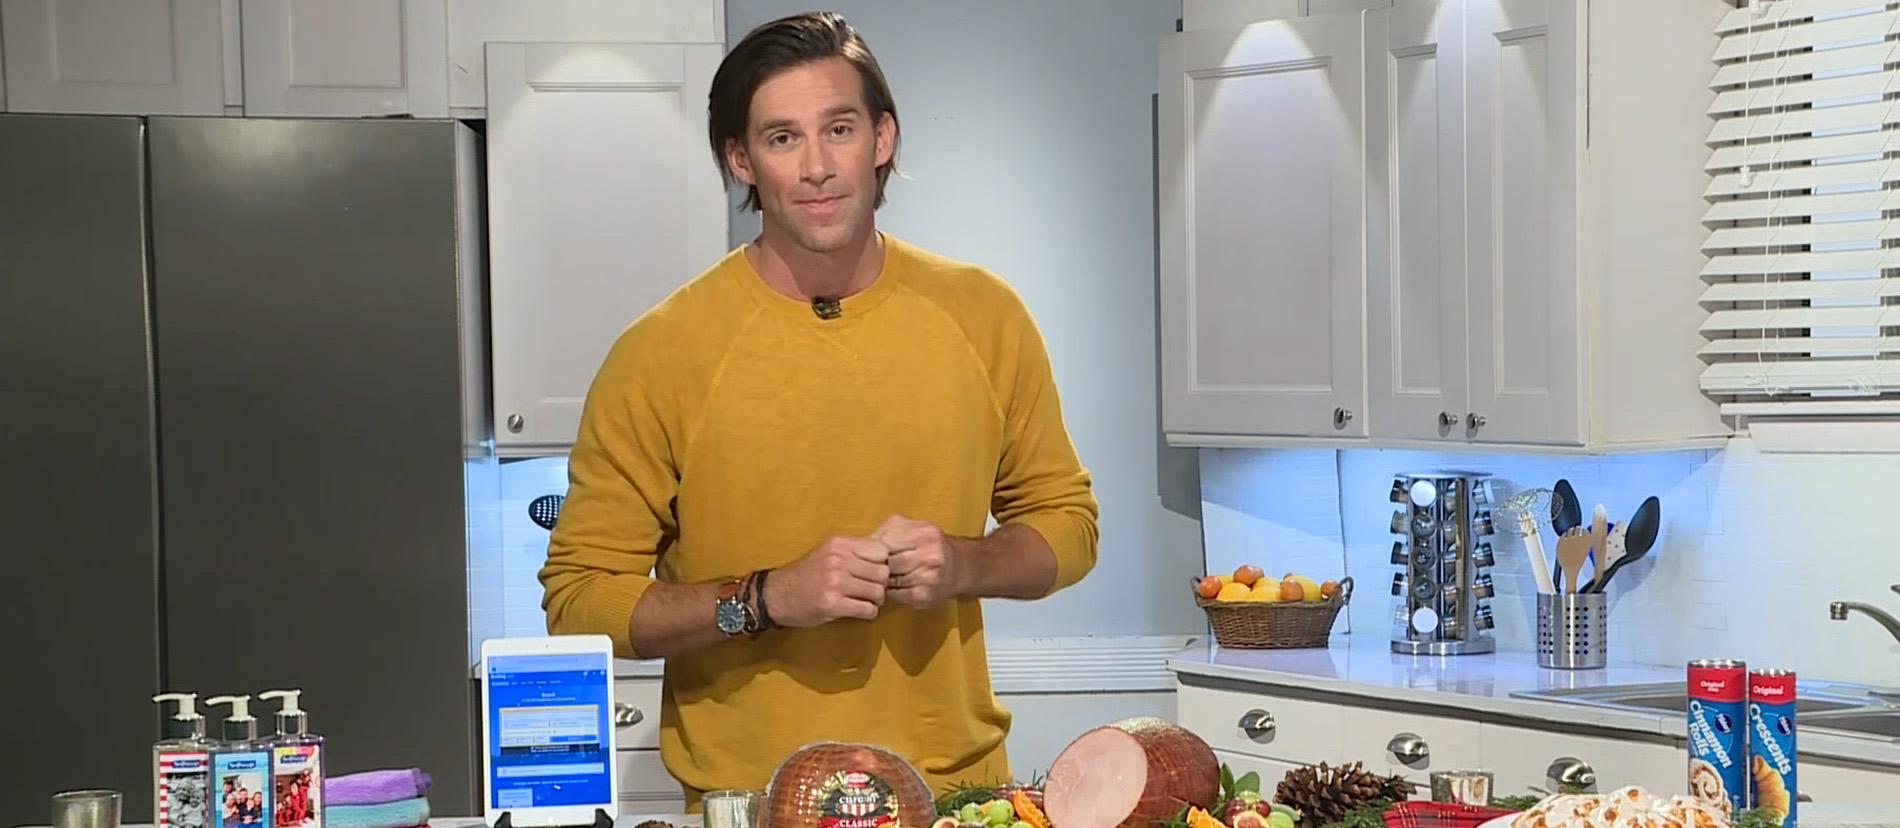 Chef and entertaining expert, James Briscione, shares his secrets for stress-free holiday hosting.